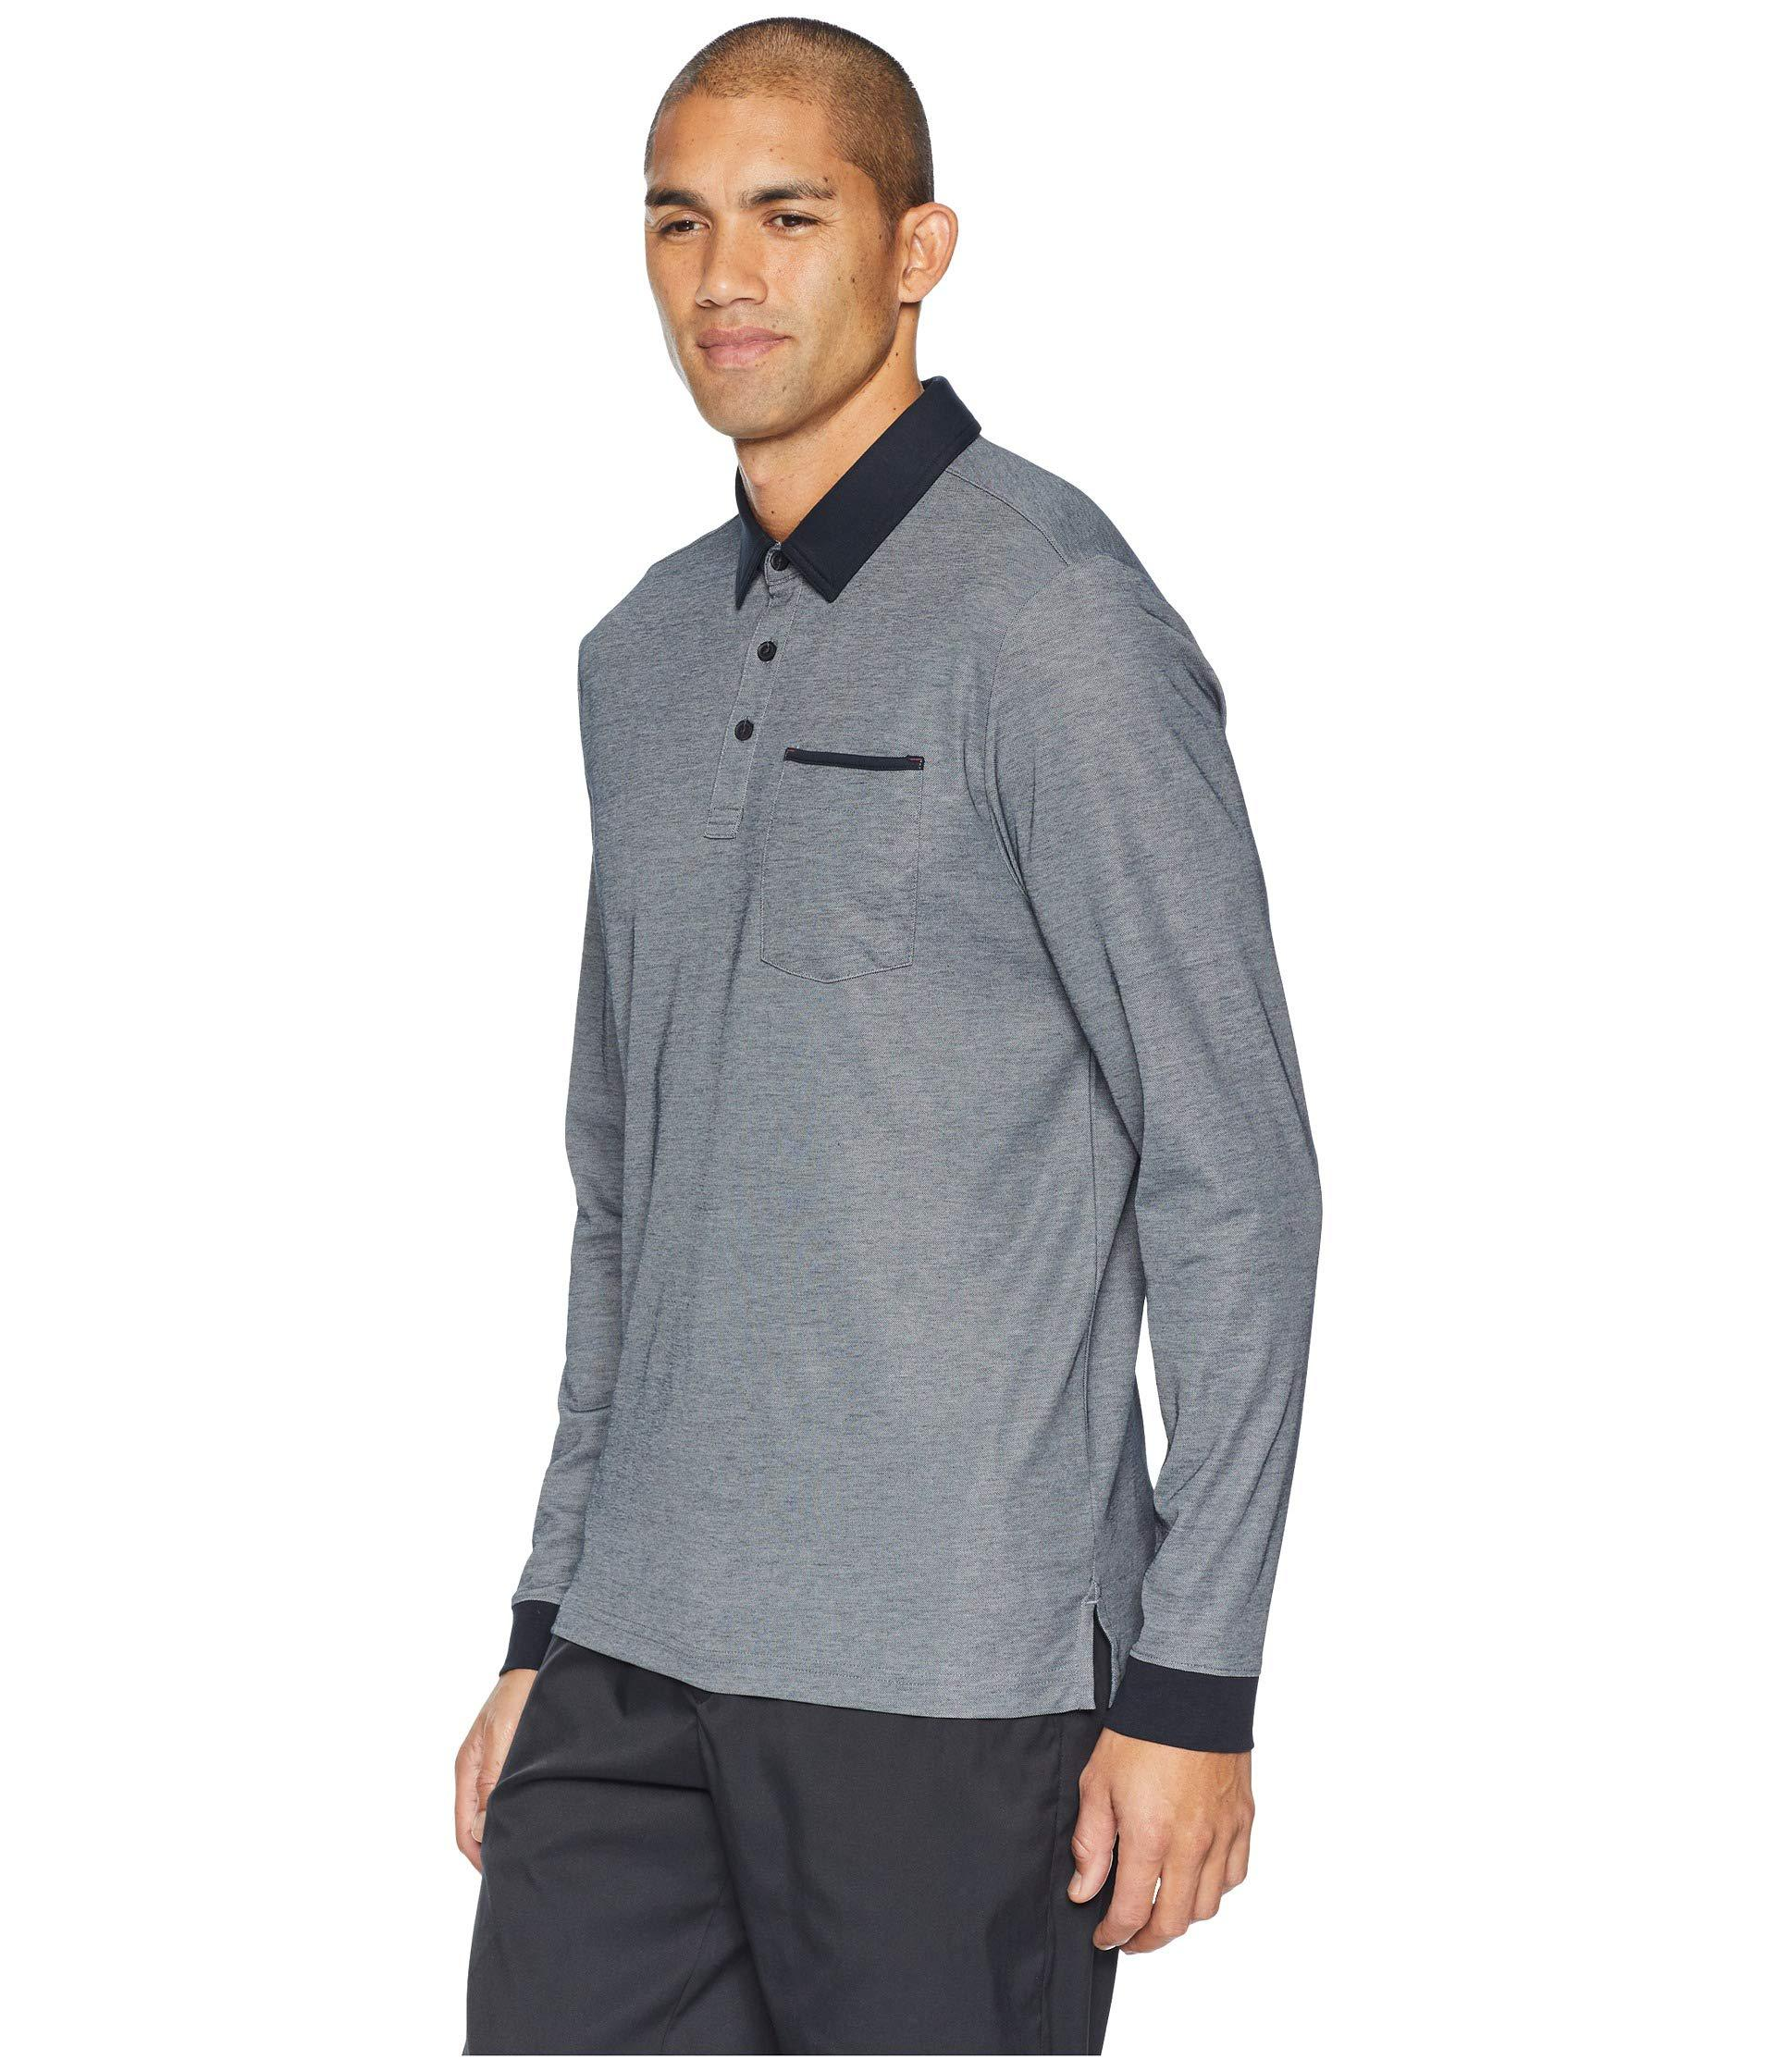 Lyst - Travis Mathew Kay Long Polo (heather Castlerock) Men s Short Sleeve  Knit in Gray for Men - Save 25% 852db4968861